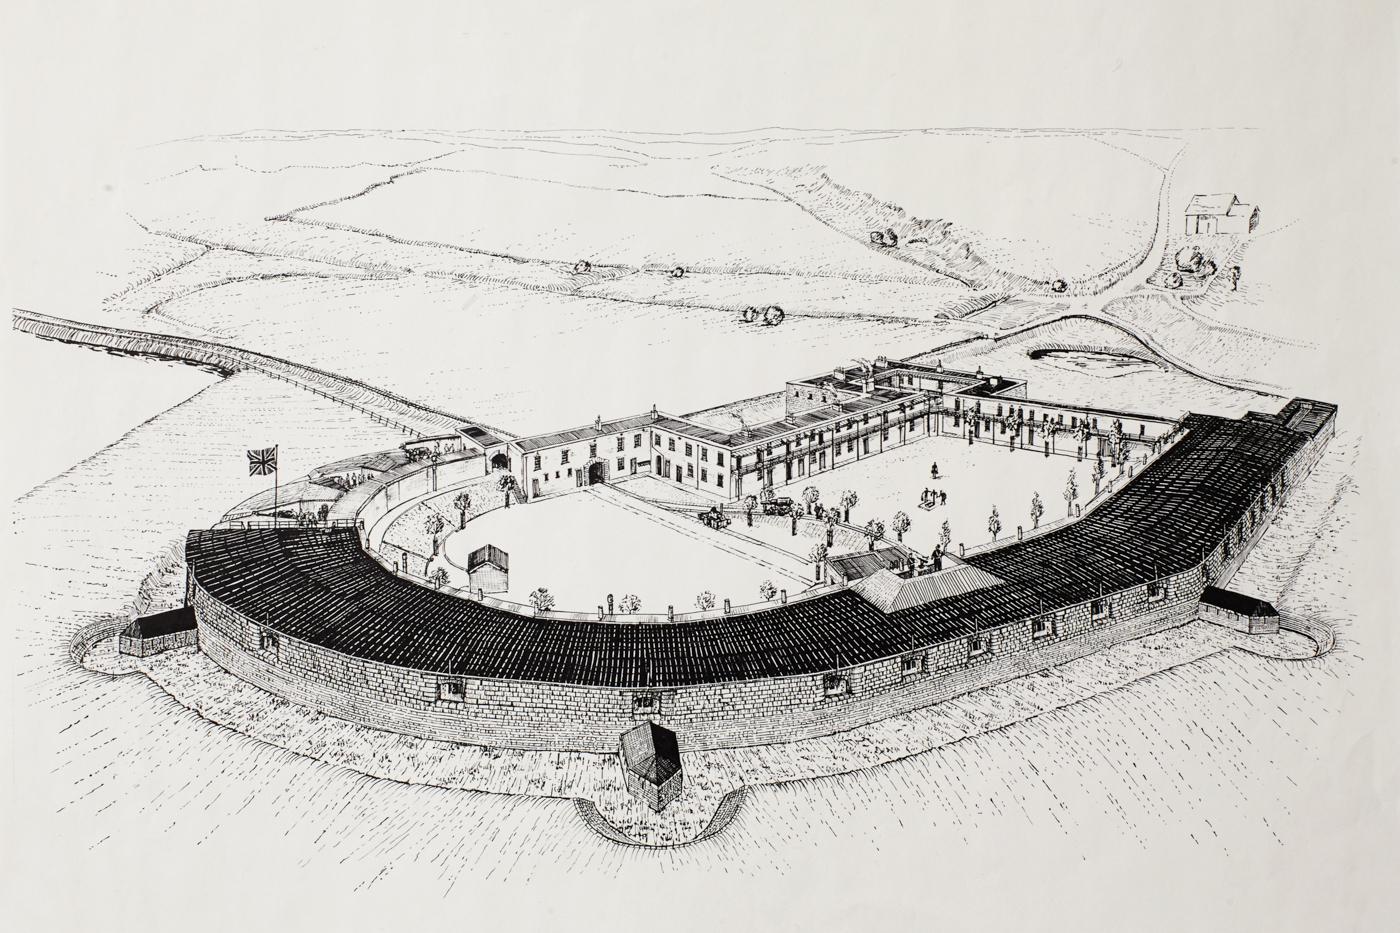 1874_New_Armoured_Casemate_Fort_Opened.jpg